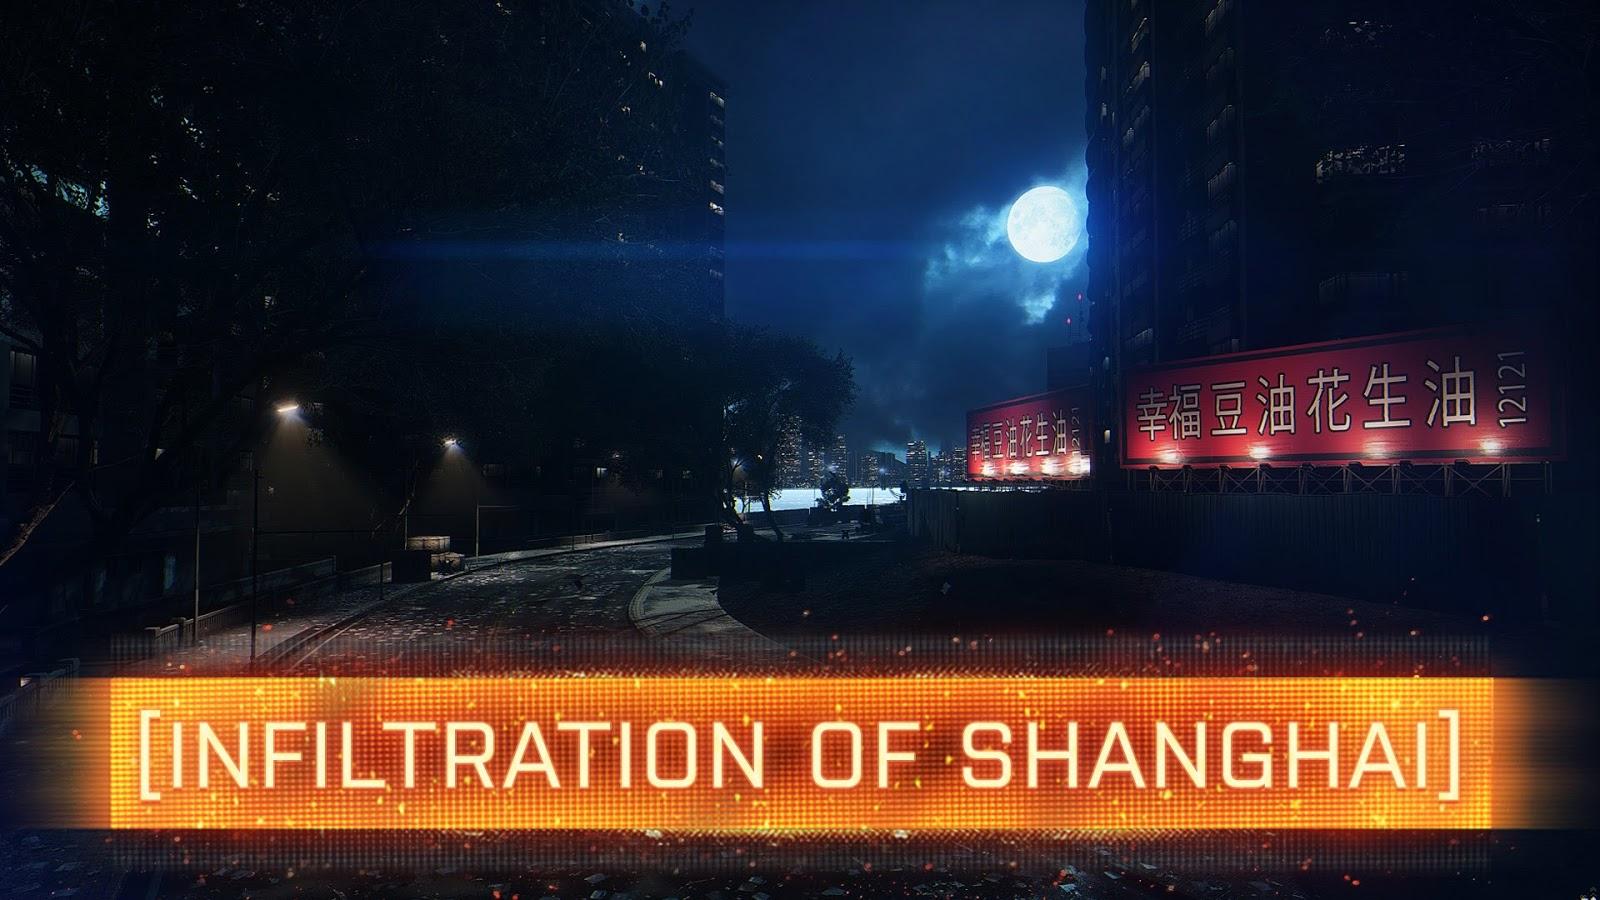 Mapa noturno Infiltration of Shanghai para Battlefield 4 está 99% finalizado